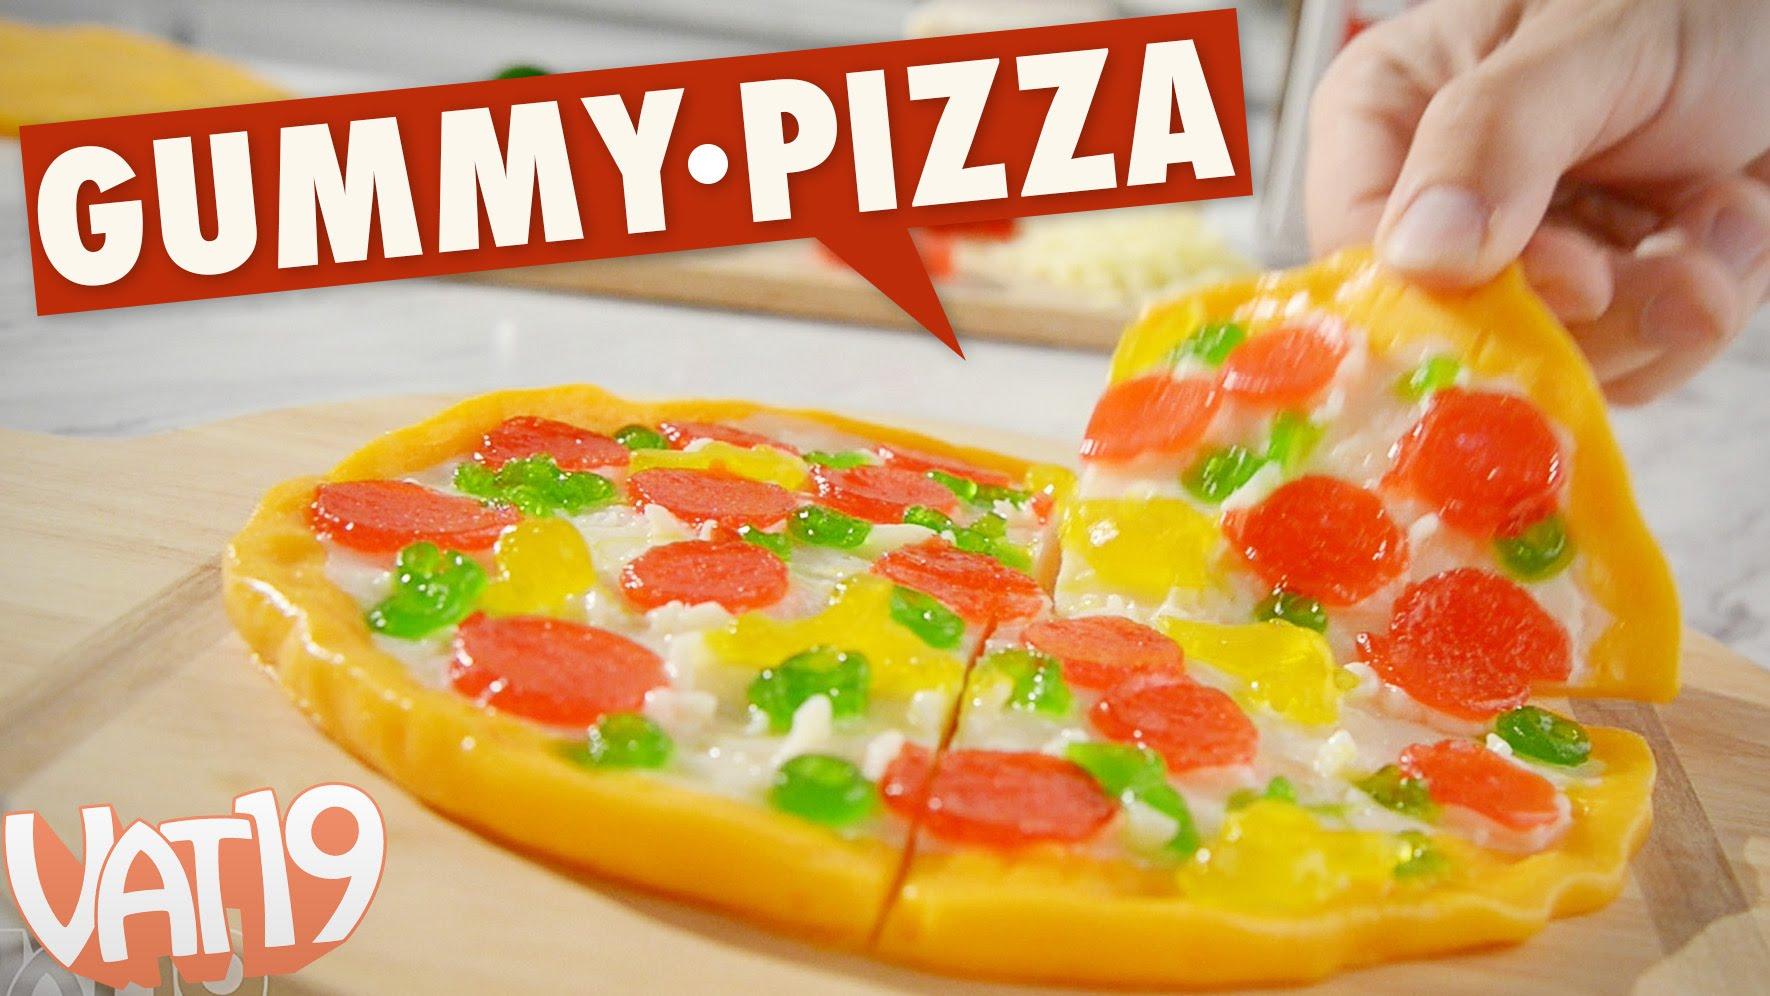 「童年回憶放大版!巨無霸比薩軟糖」- It's Delivery and It's Gummy!